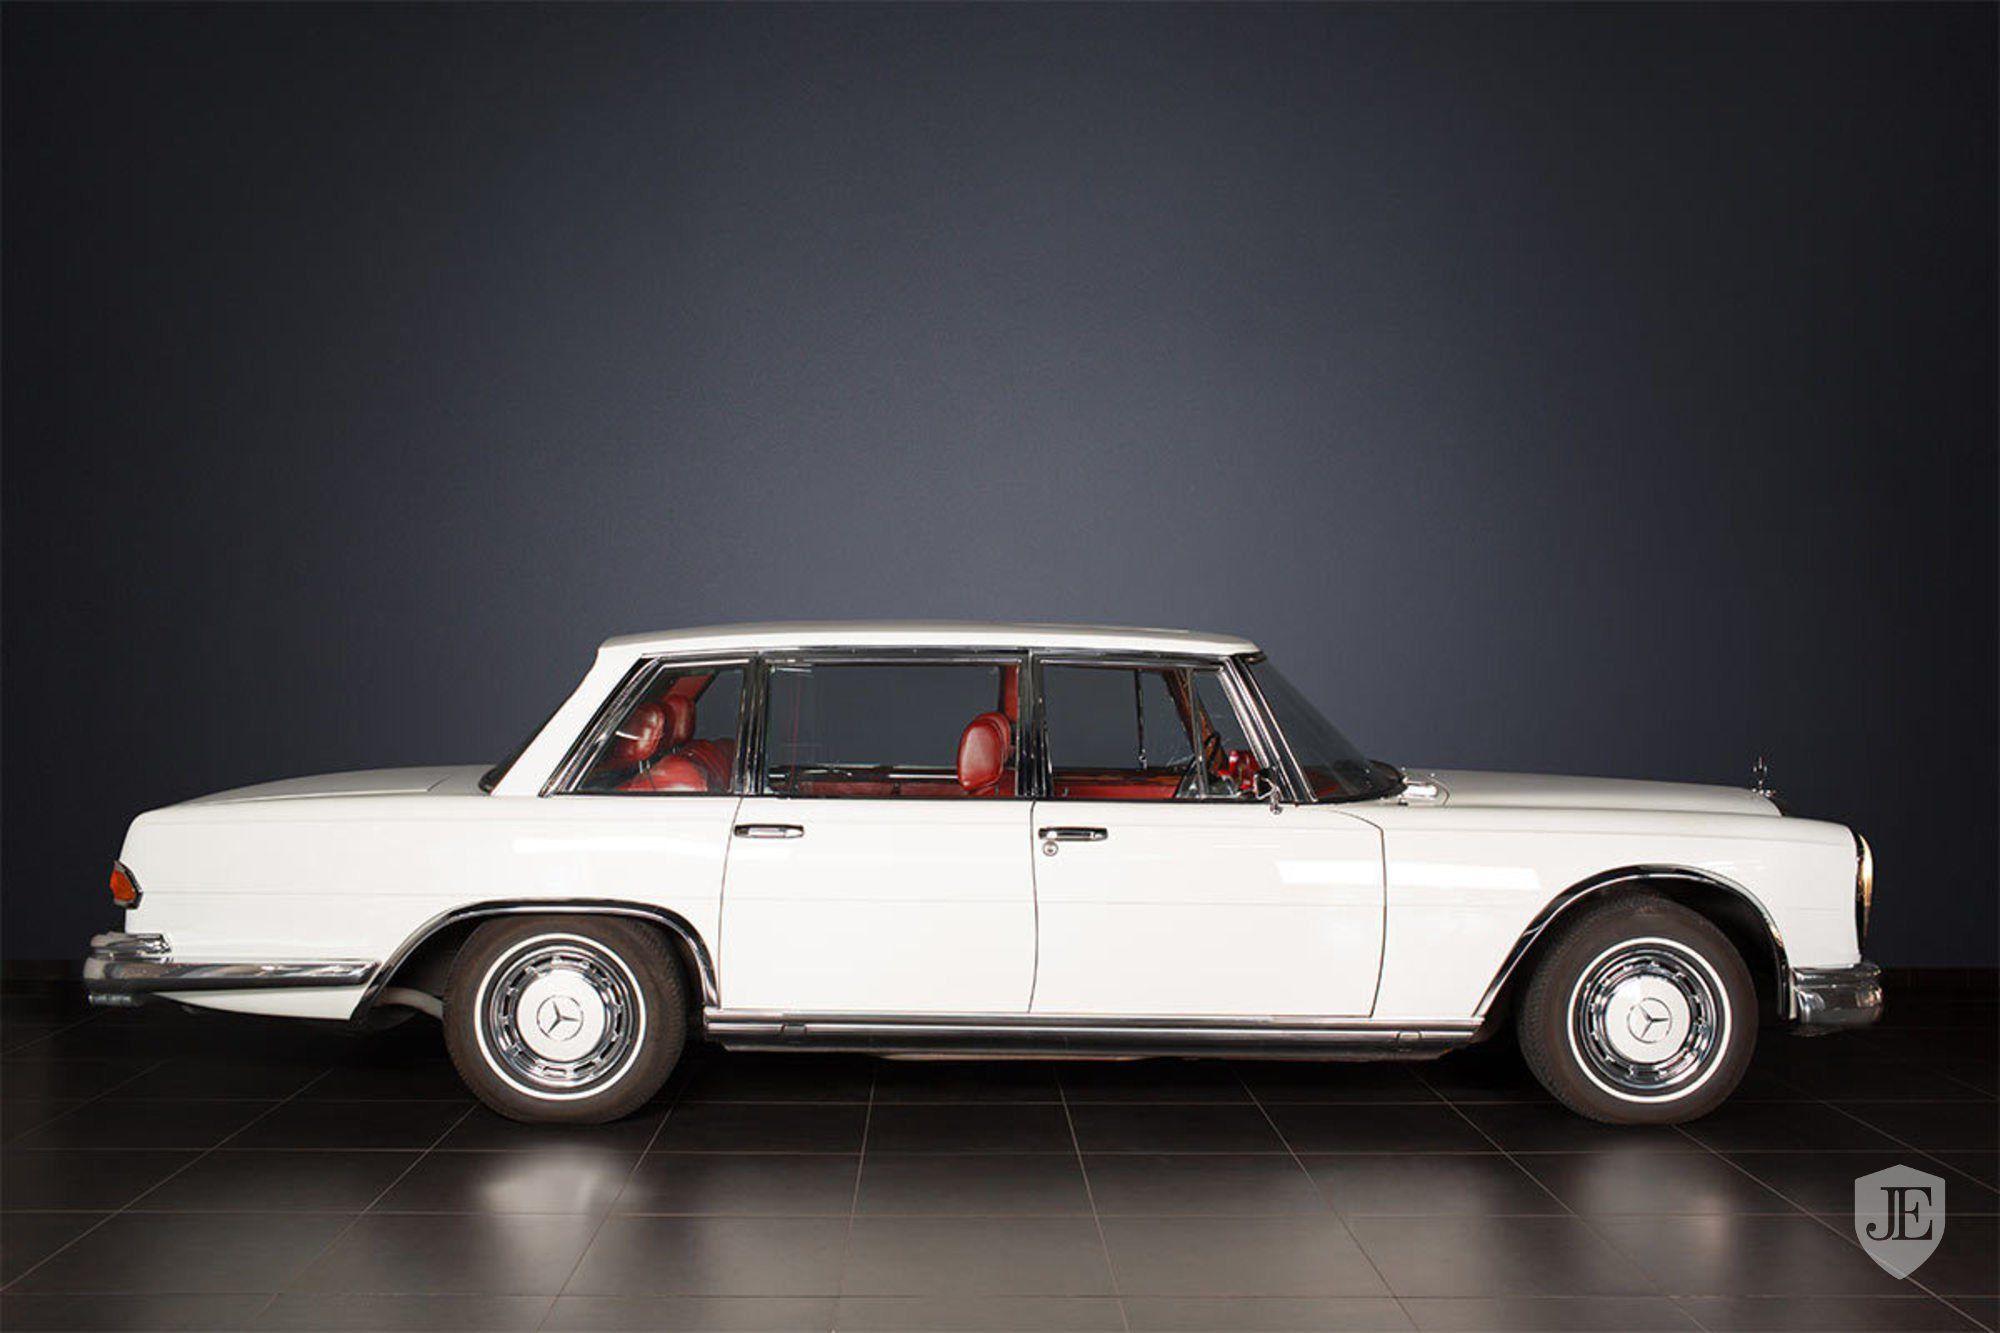 1971 Mercedes Benz 600 In Undenheim, Germany For Sale (10406220)   Mercedes  benz, Mercedes, Mercedes benz classic